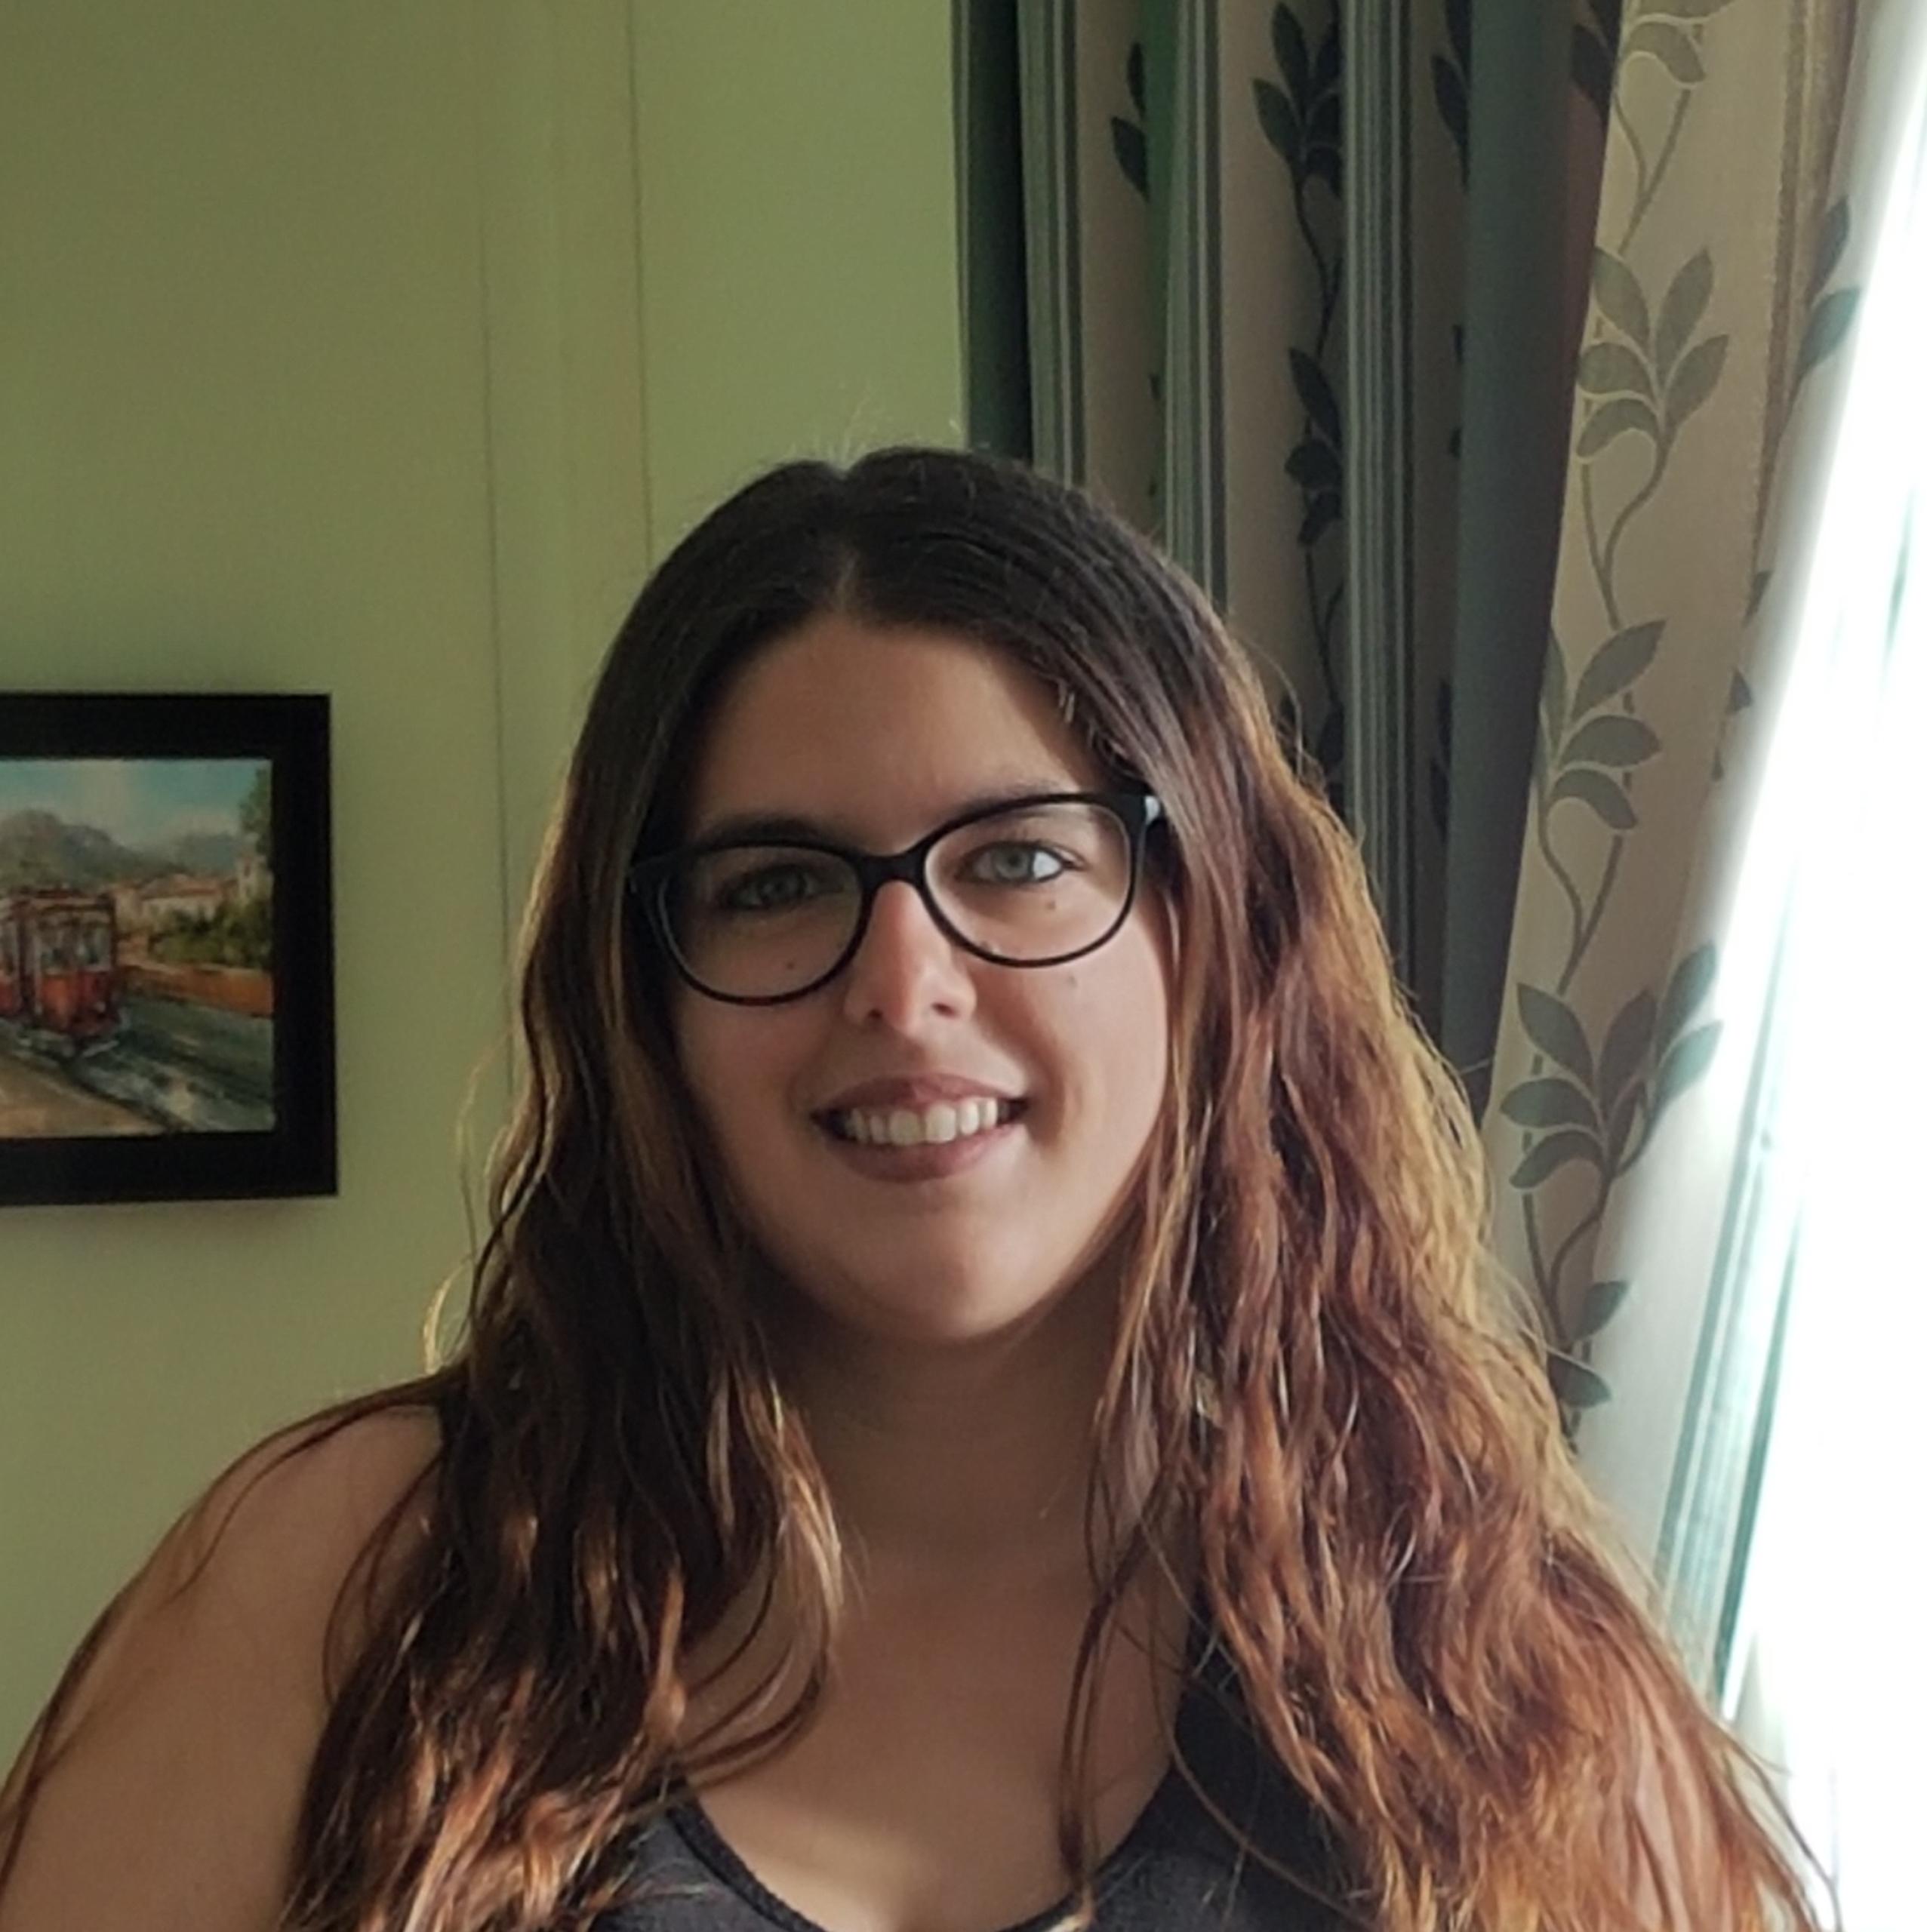 Raquel Merino